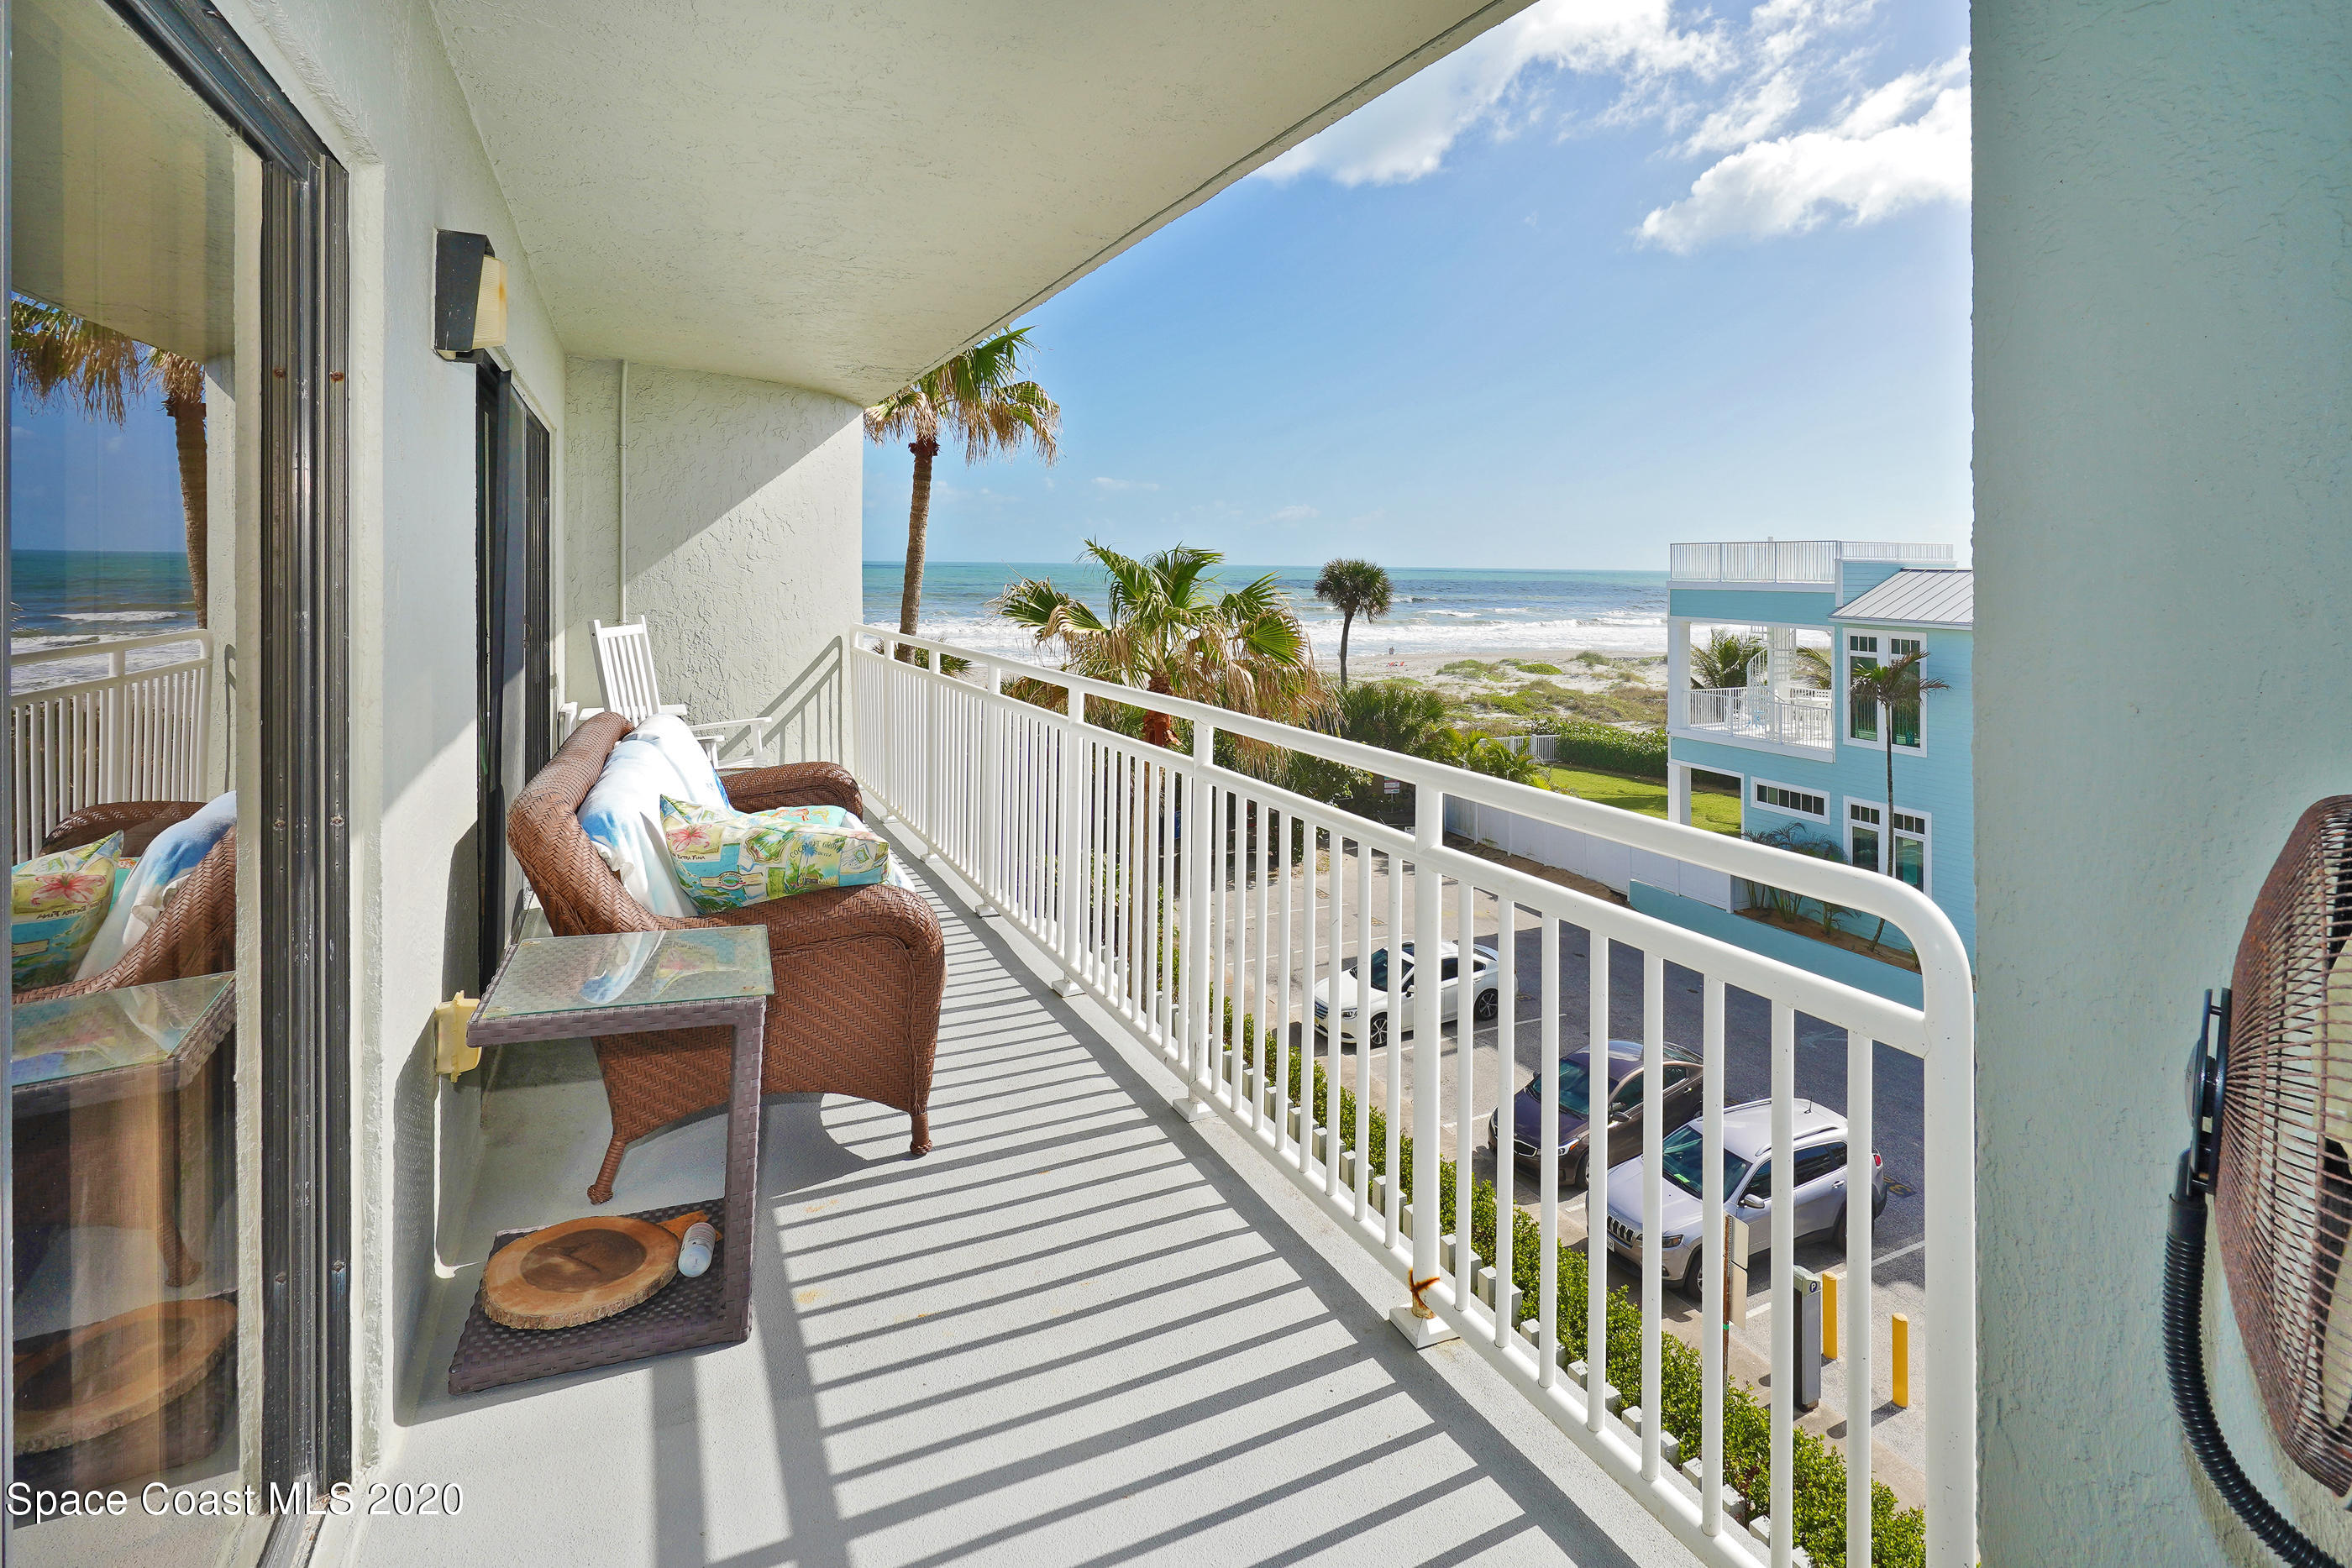 Balcony has SE Ocean View